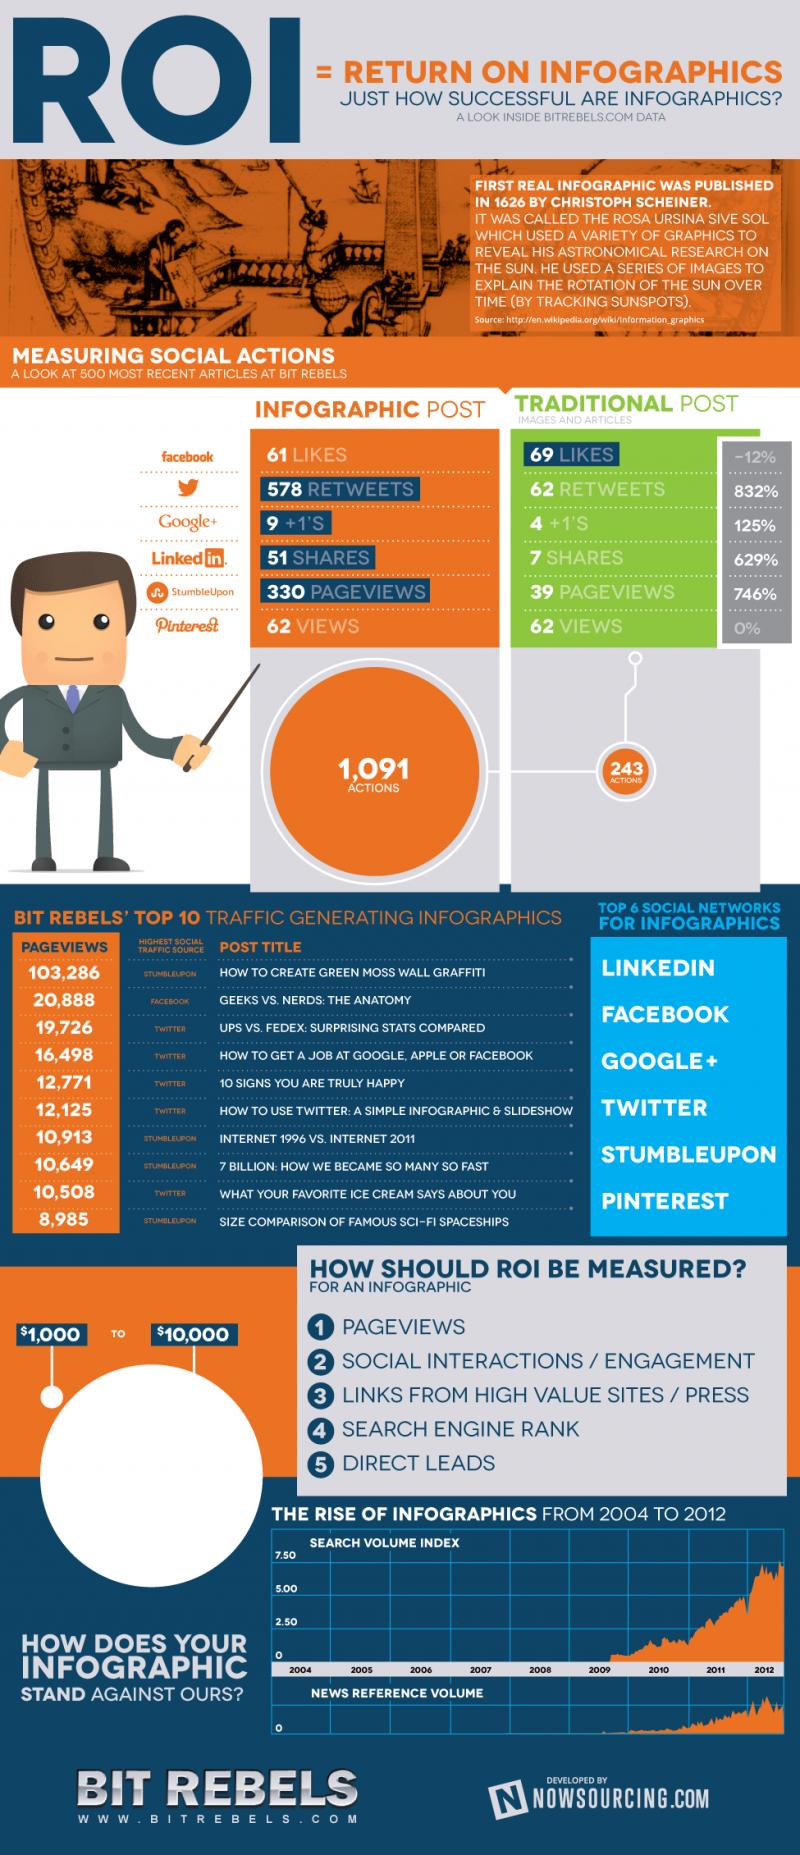 Return on #infographic